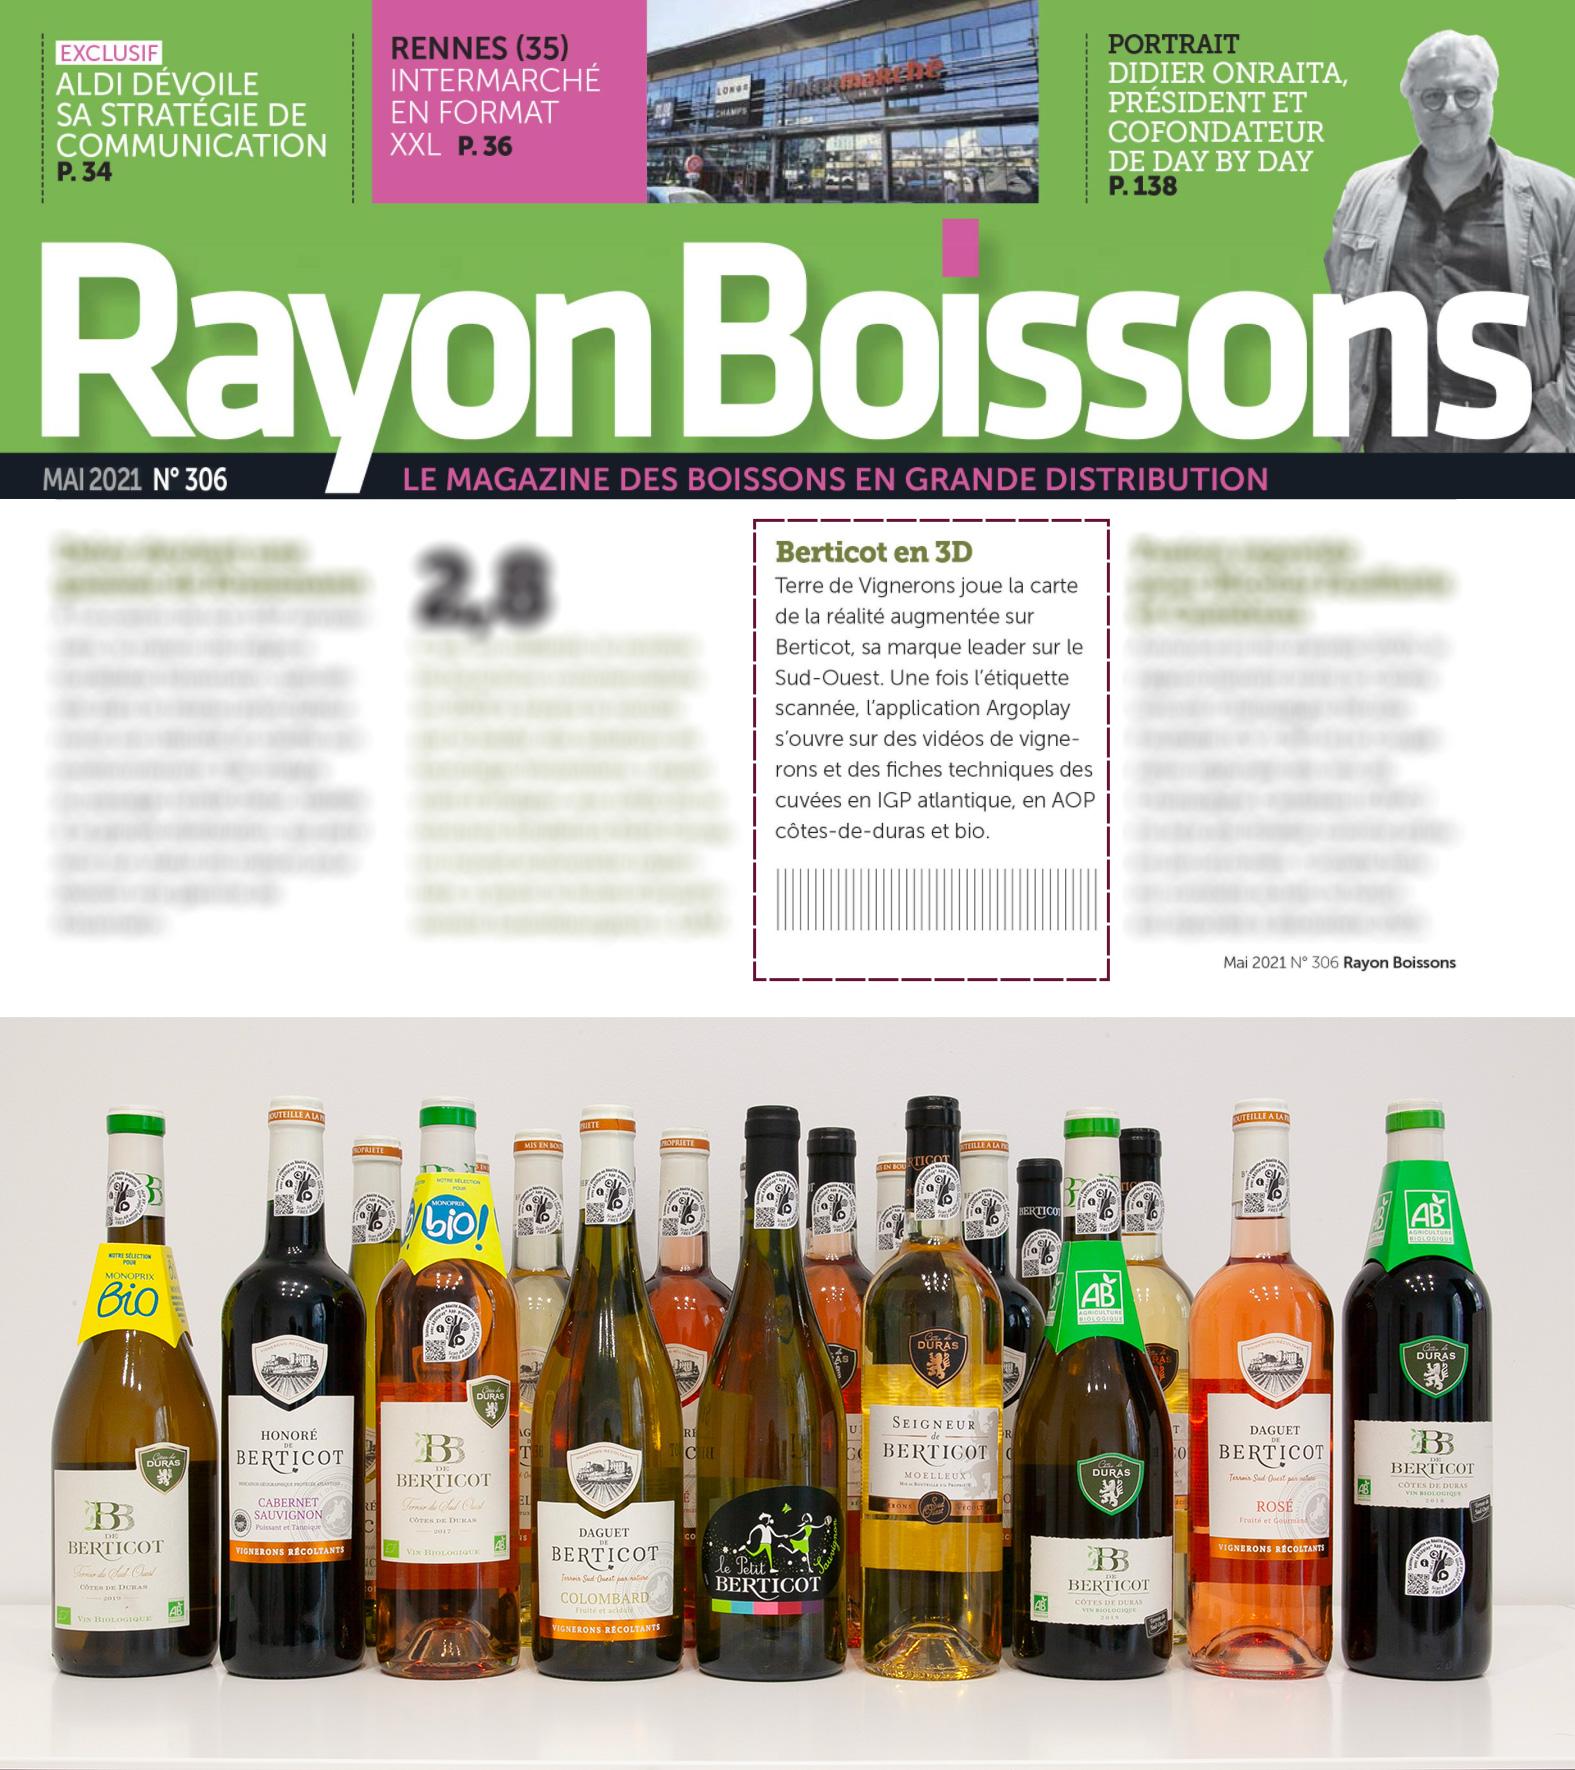 https://ar-winelabels.com/Rayon